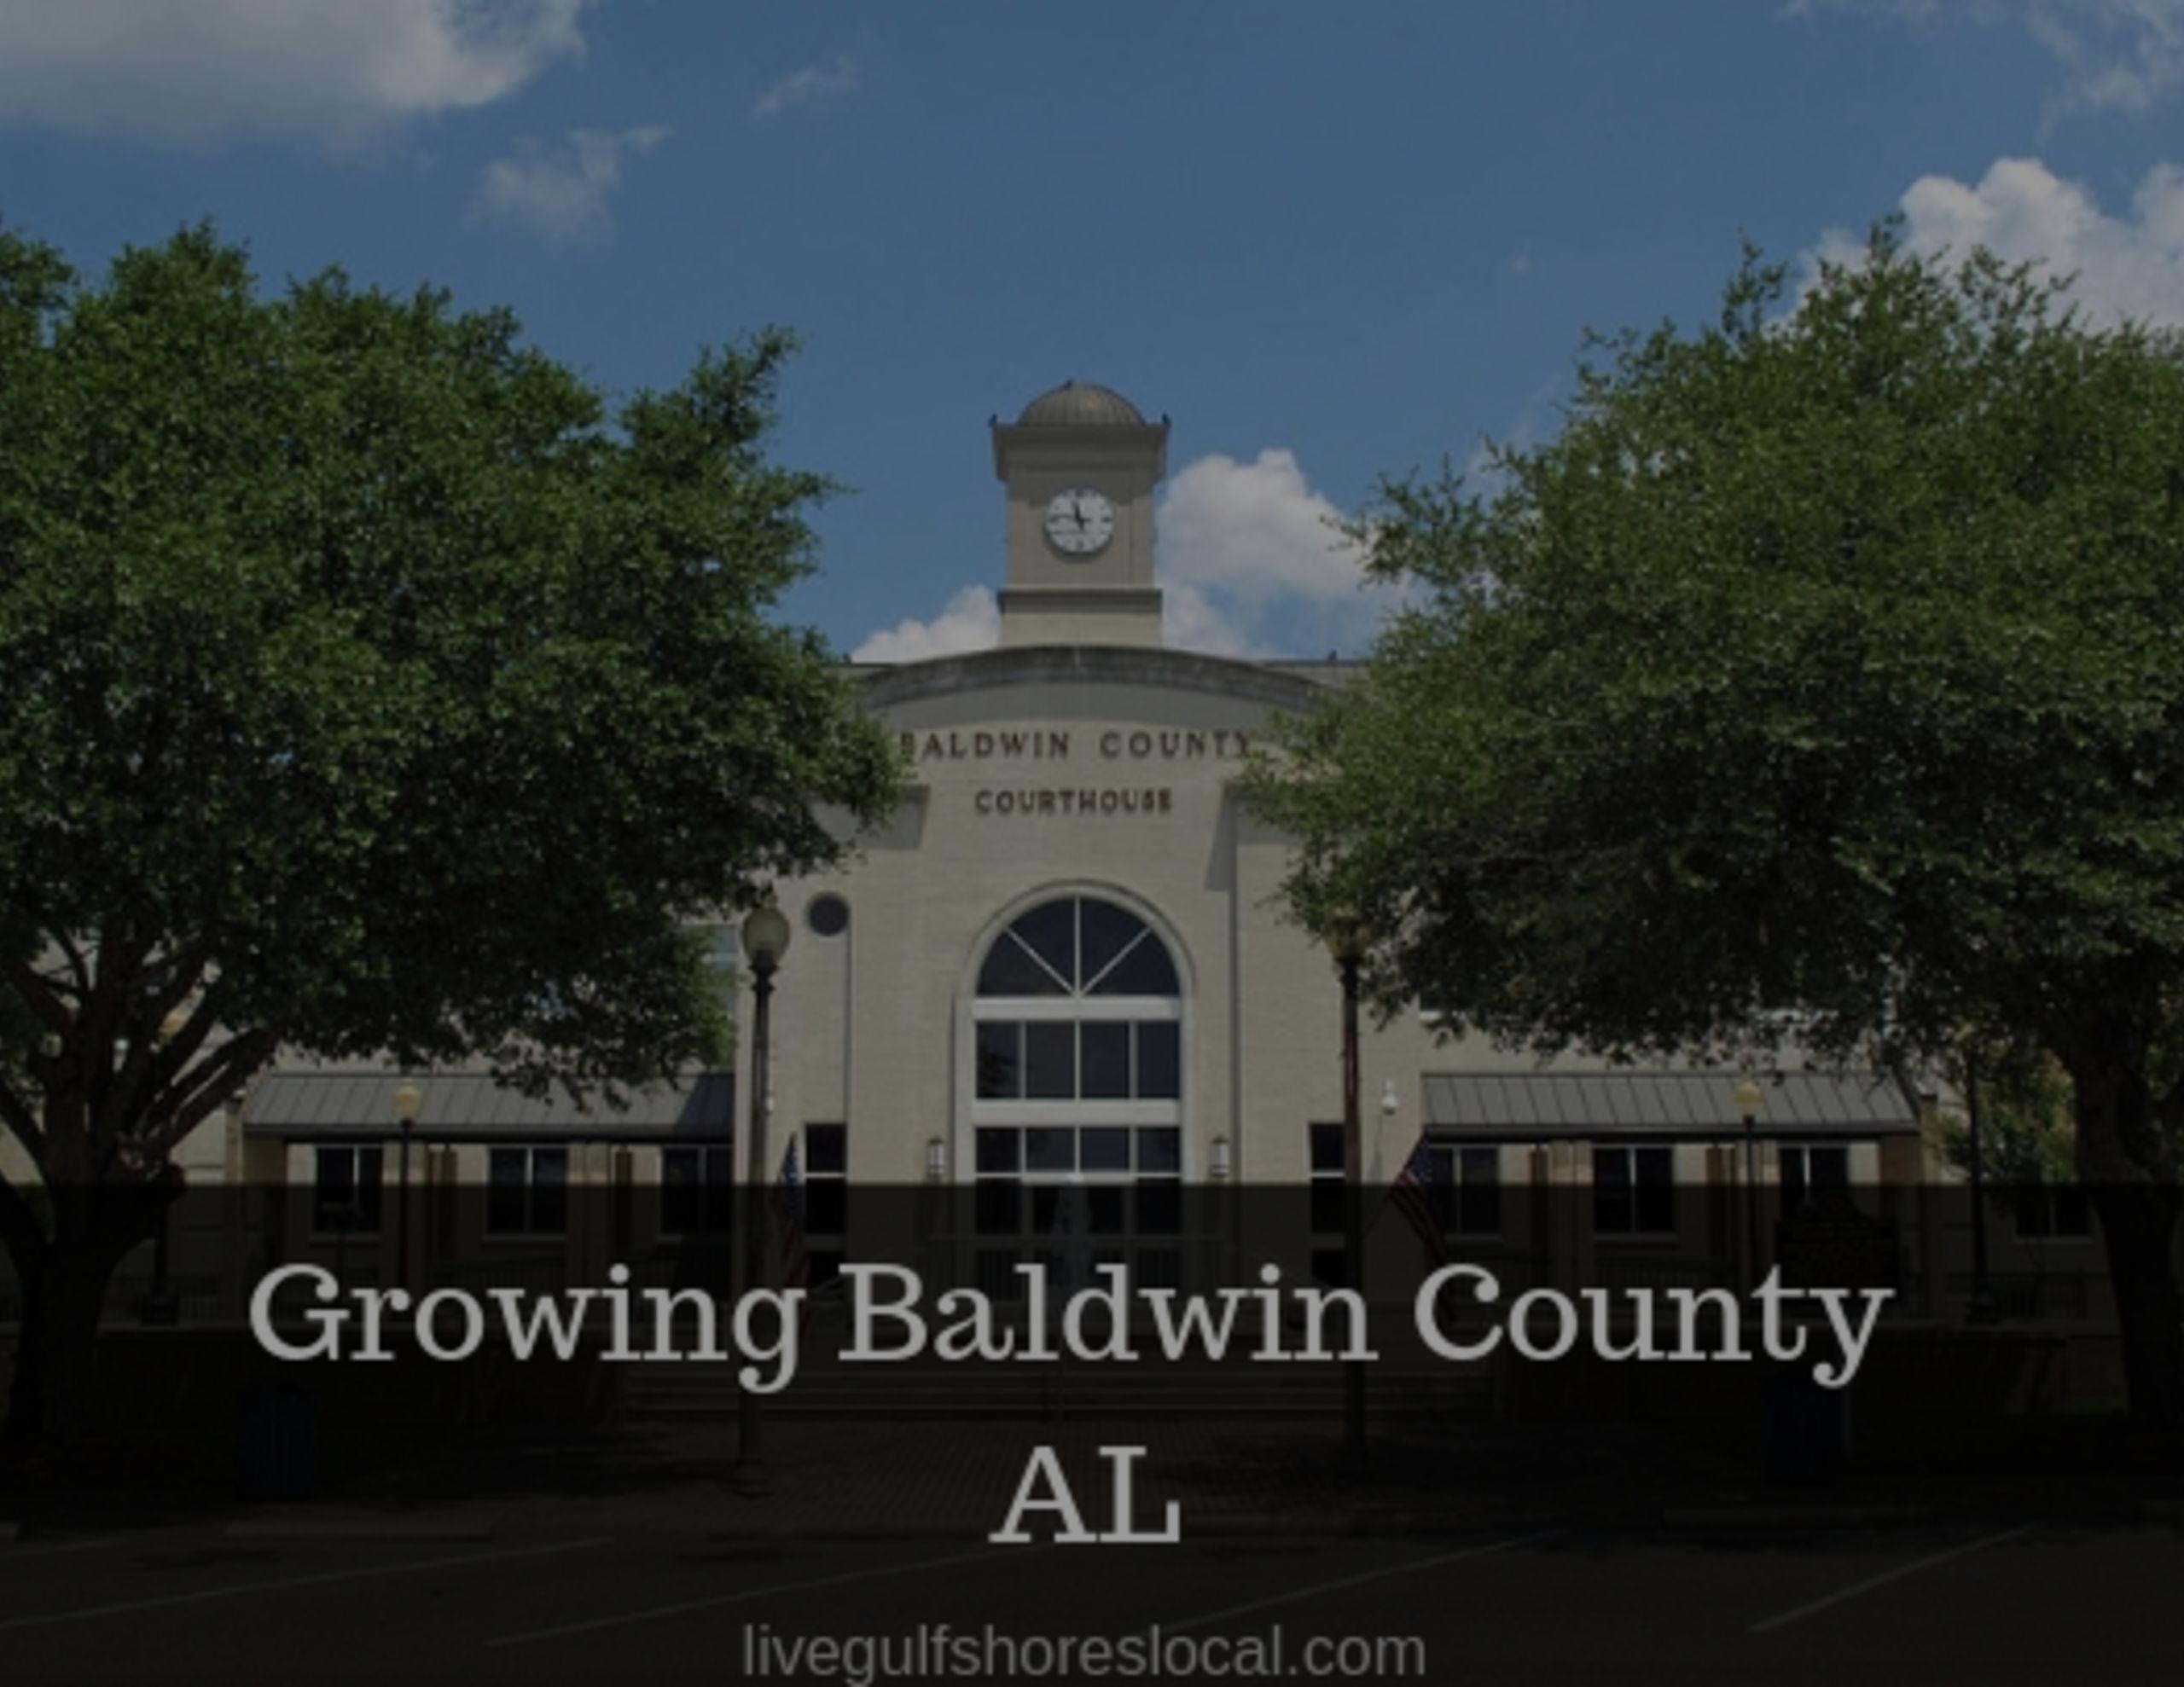 Baldwin County Continues to Grow